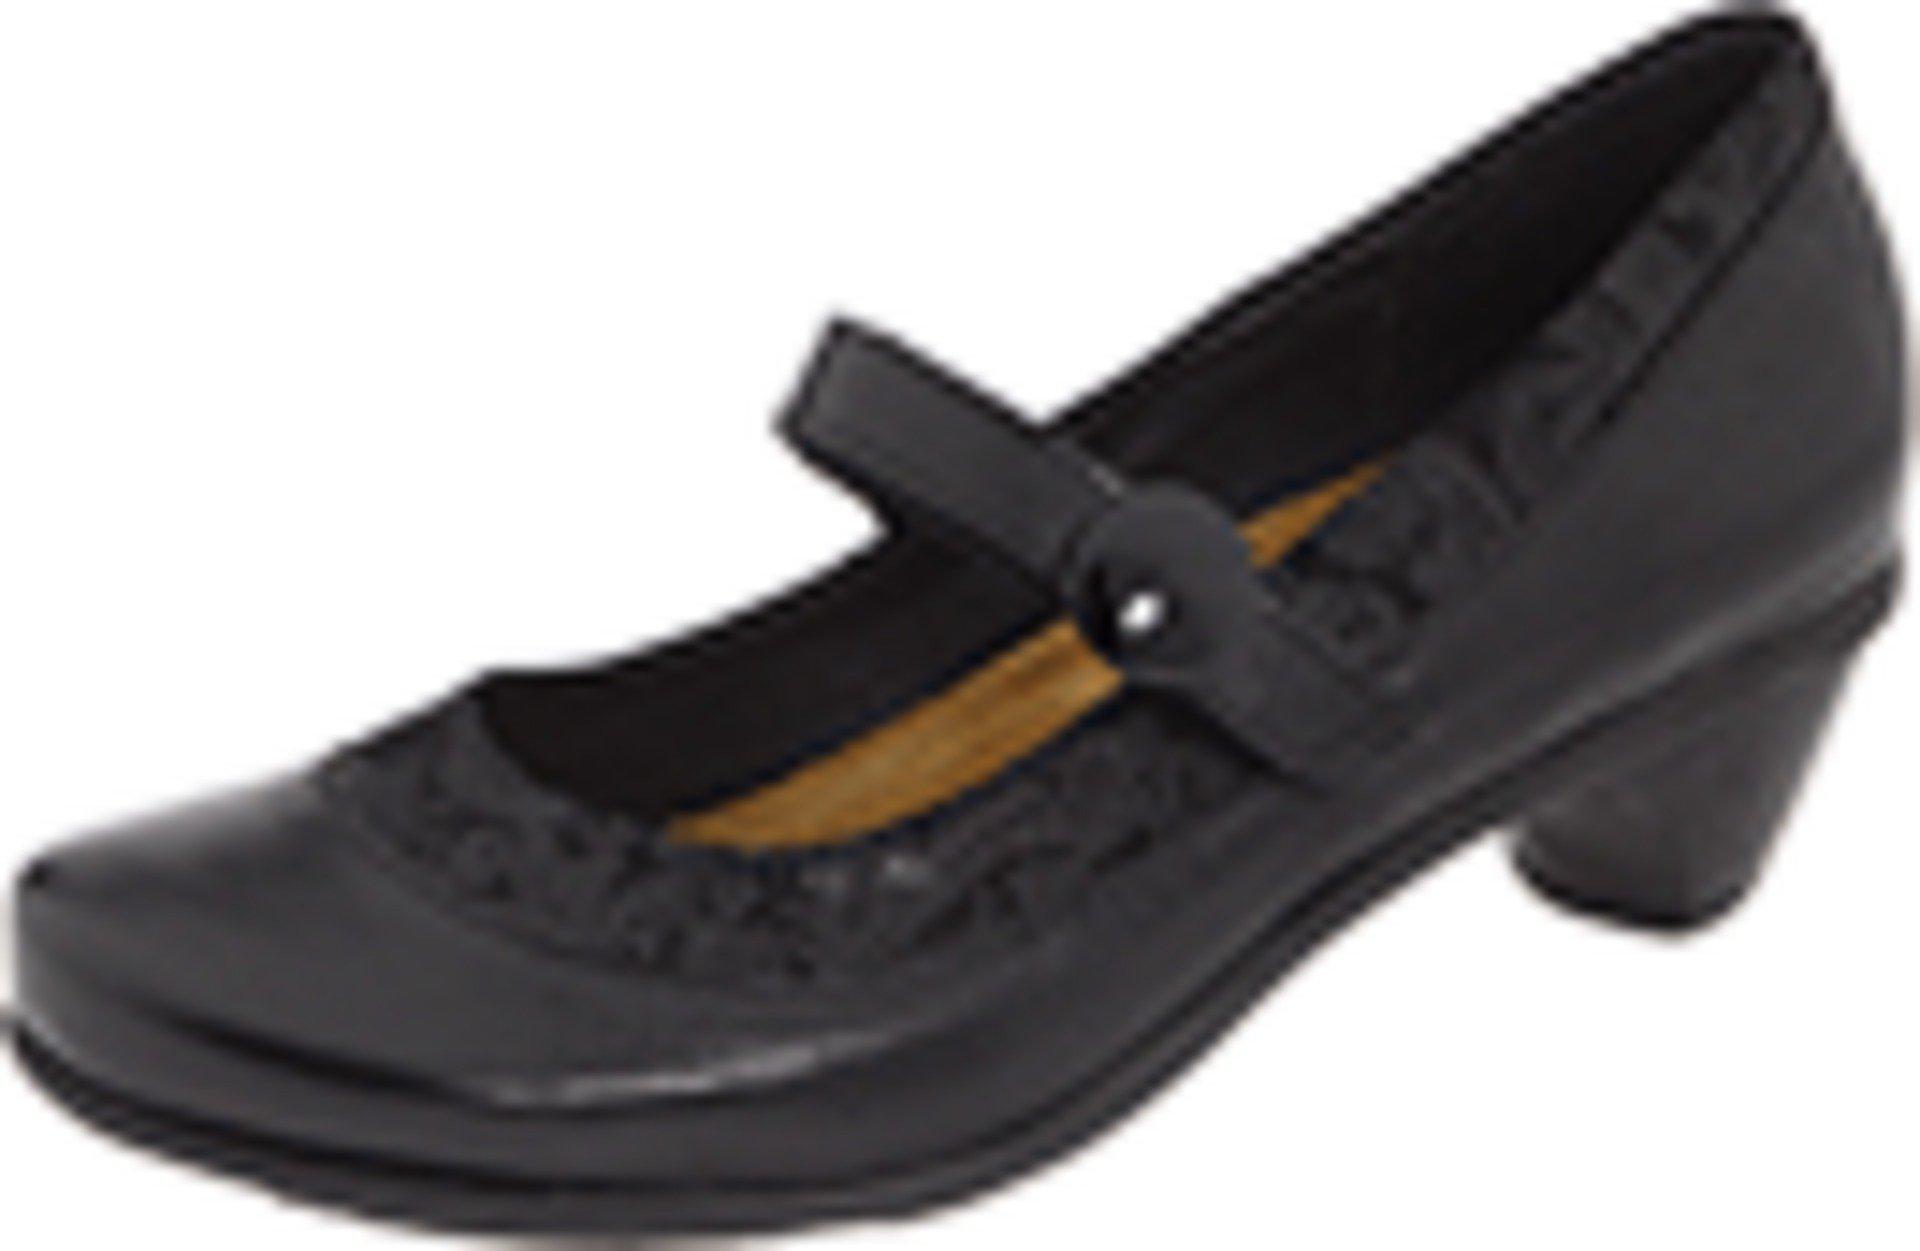 Naot Women's Trendy Black Gloss Leather/Black Lace Nubuck Pumps 35 M